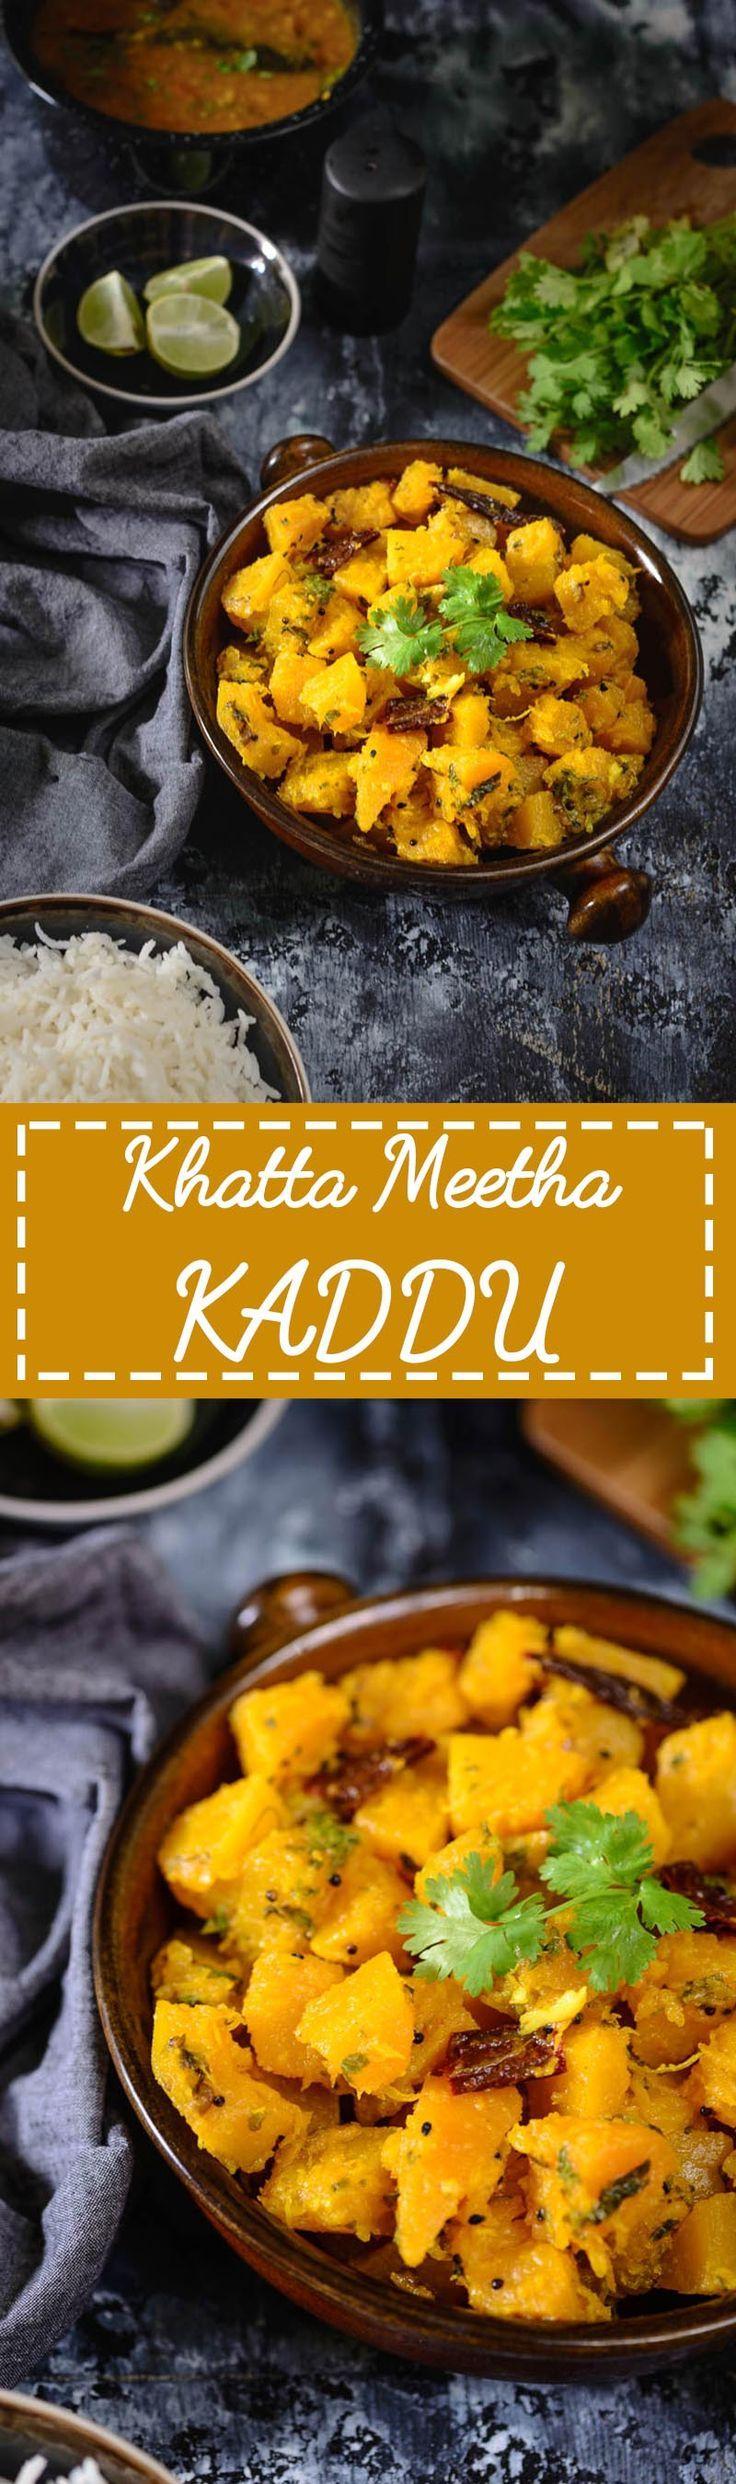 Khatta Meetha Kaddu recipe is a simple everyday Indian vegetarian dish made using pumpkin. It goes very well with paratha or Poori. Read its recipe. #Indian #Pumpkin #Sabzi #Sabji #Curry #Sweet #Sour #Vegetarian